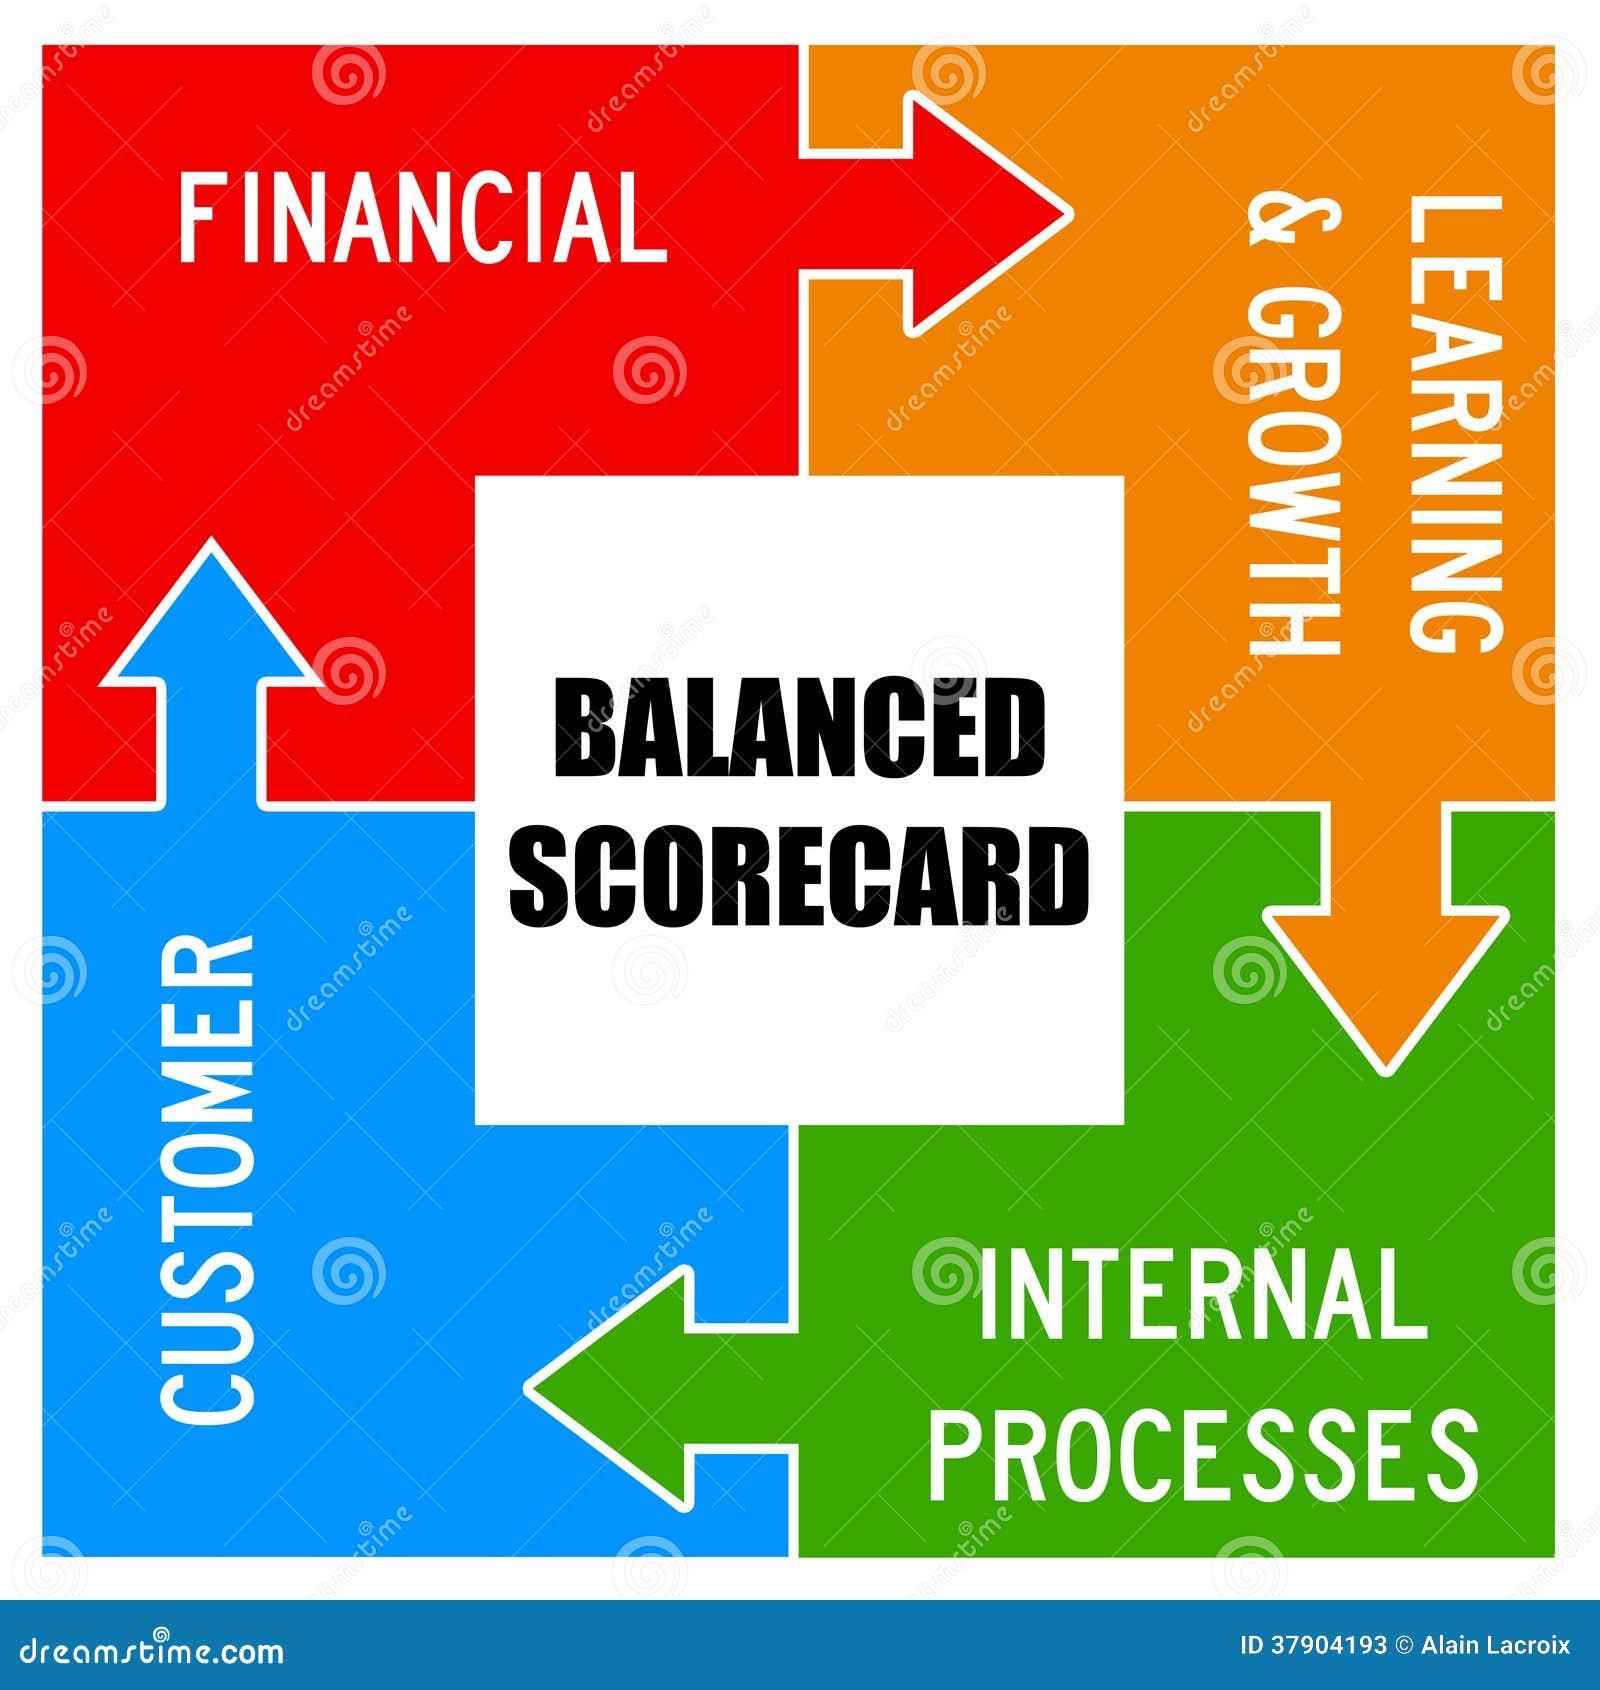 balanced scorecard stock illustration cartoondealercom